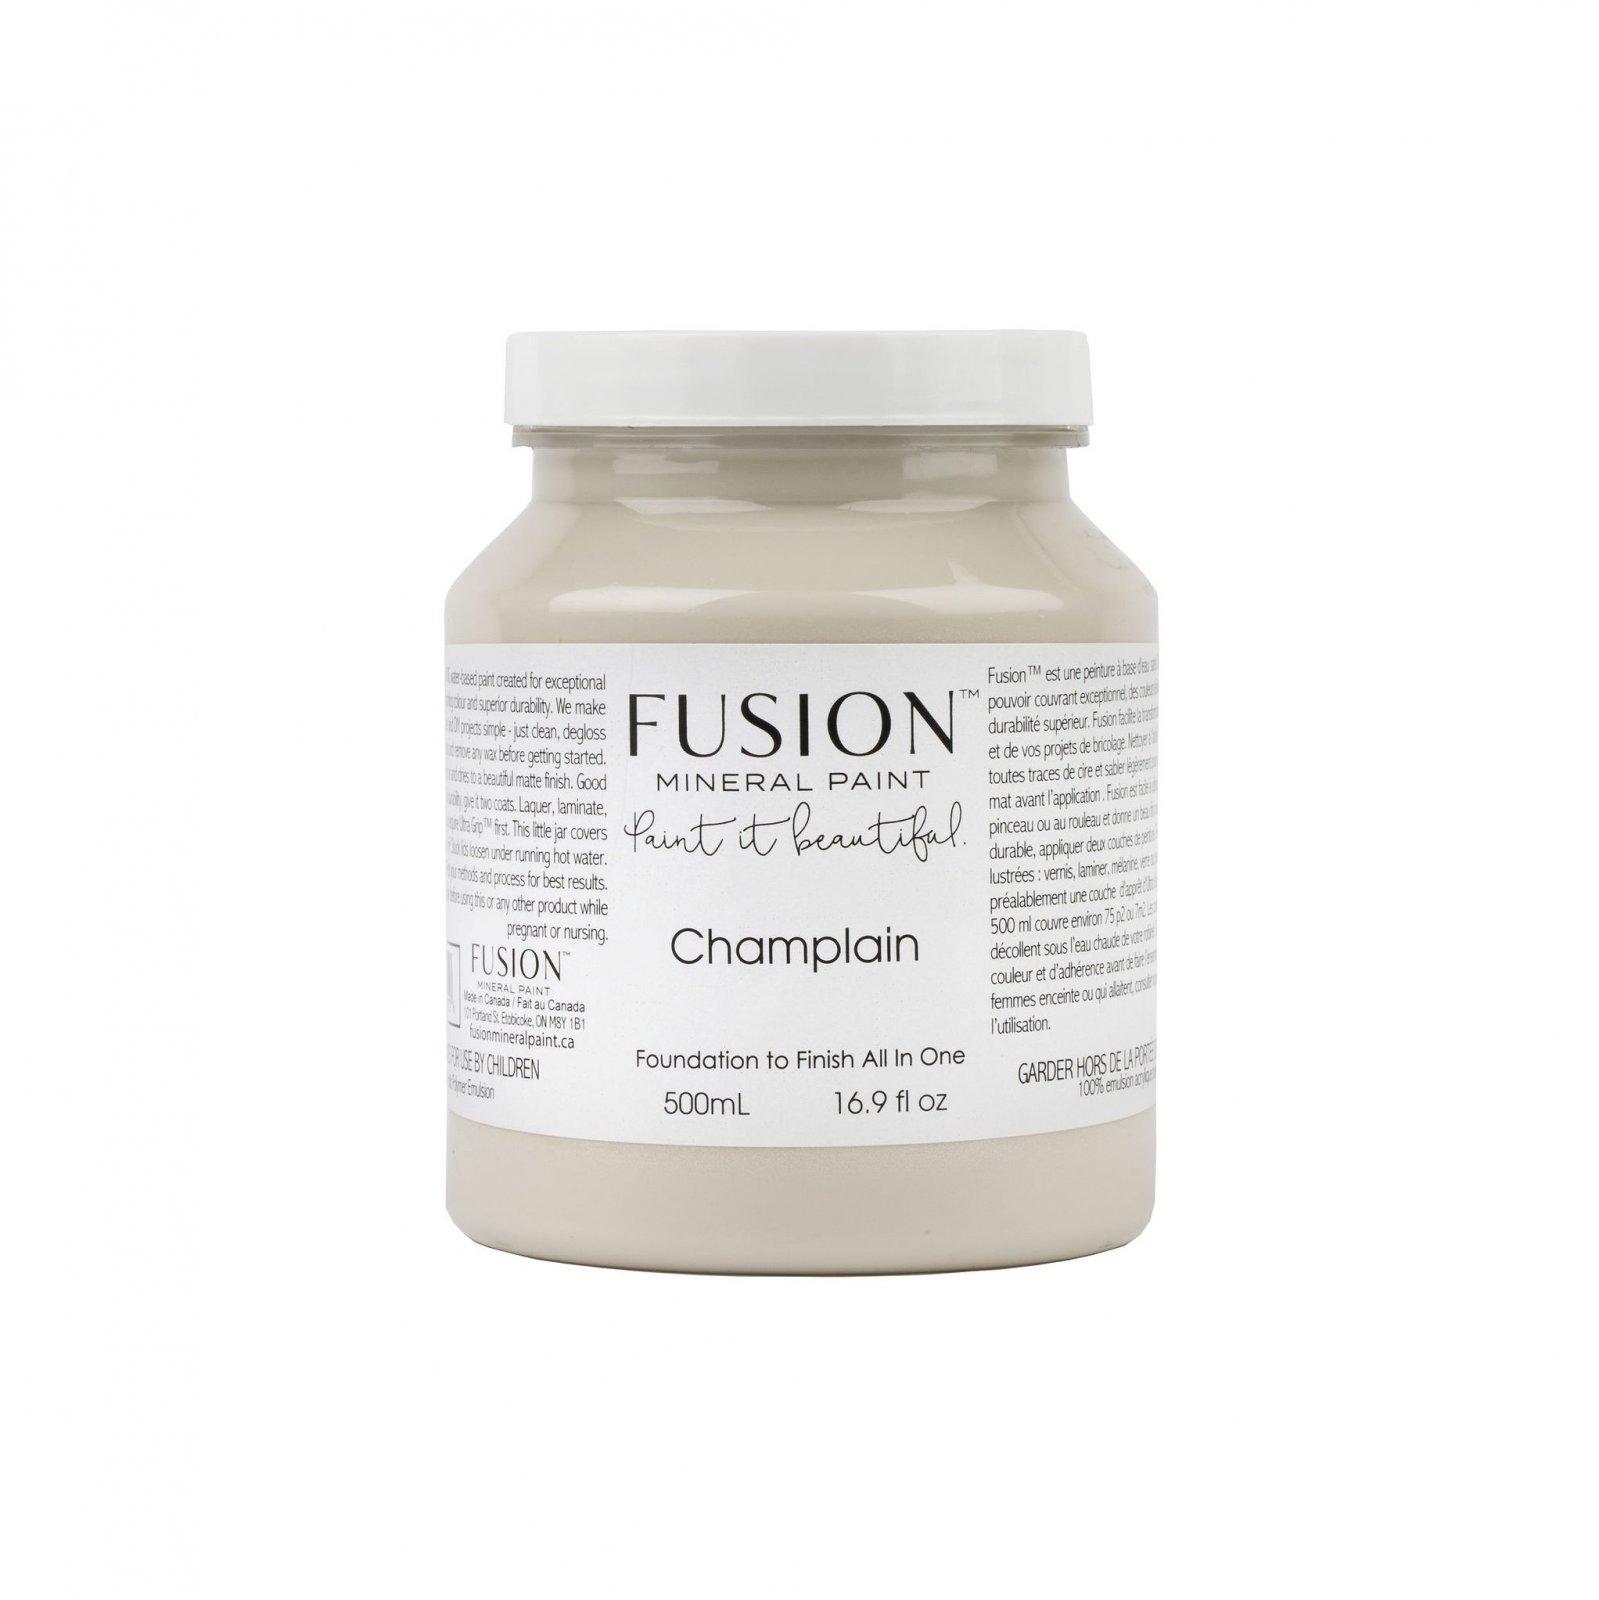 Champlain Pint Fusion Mineral Paint